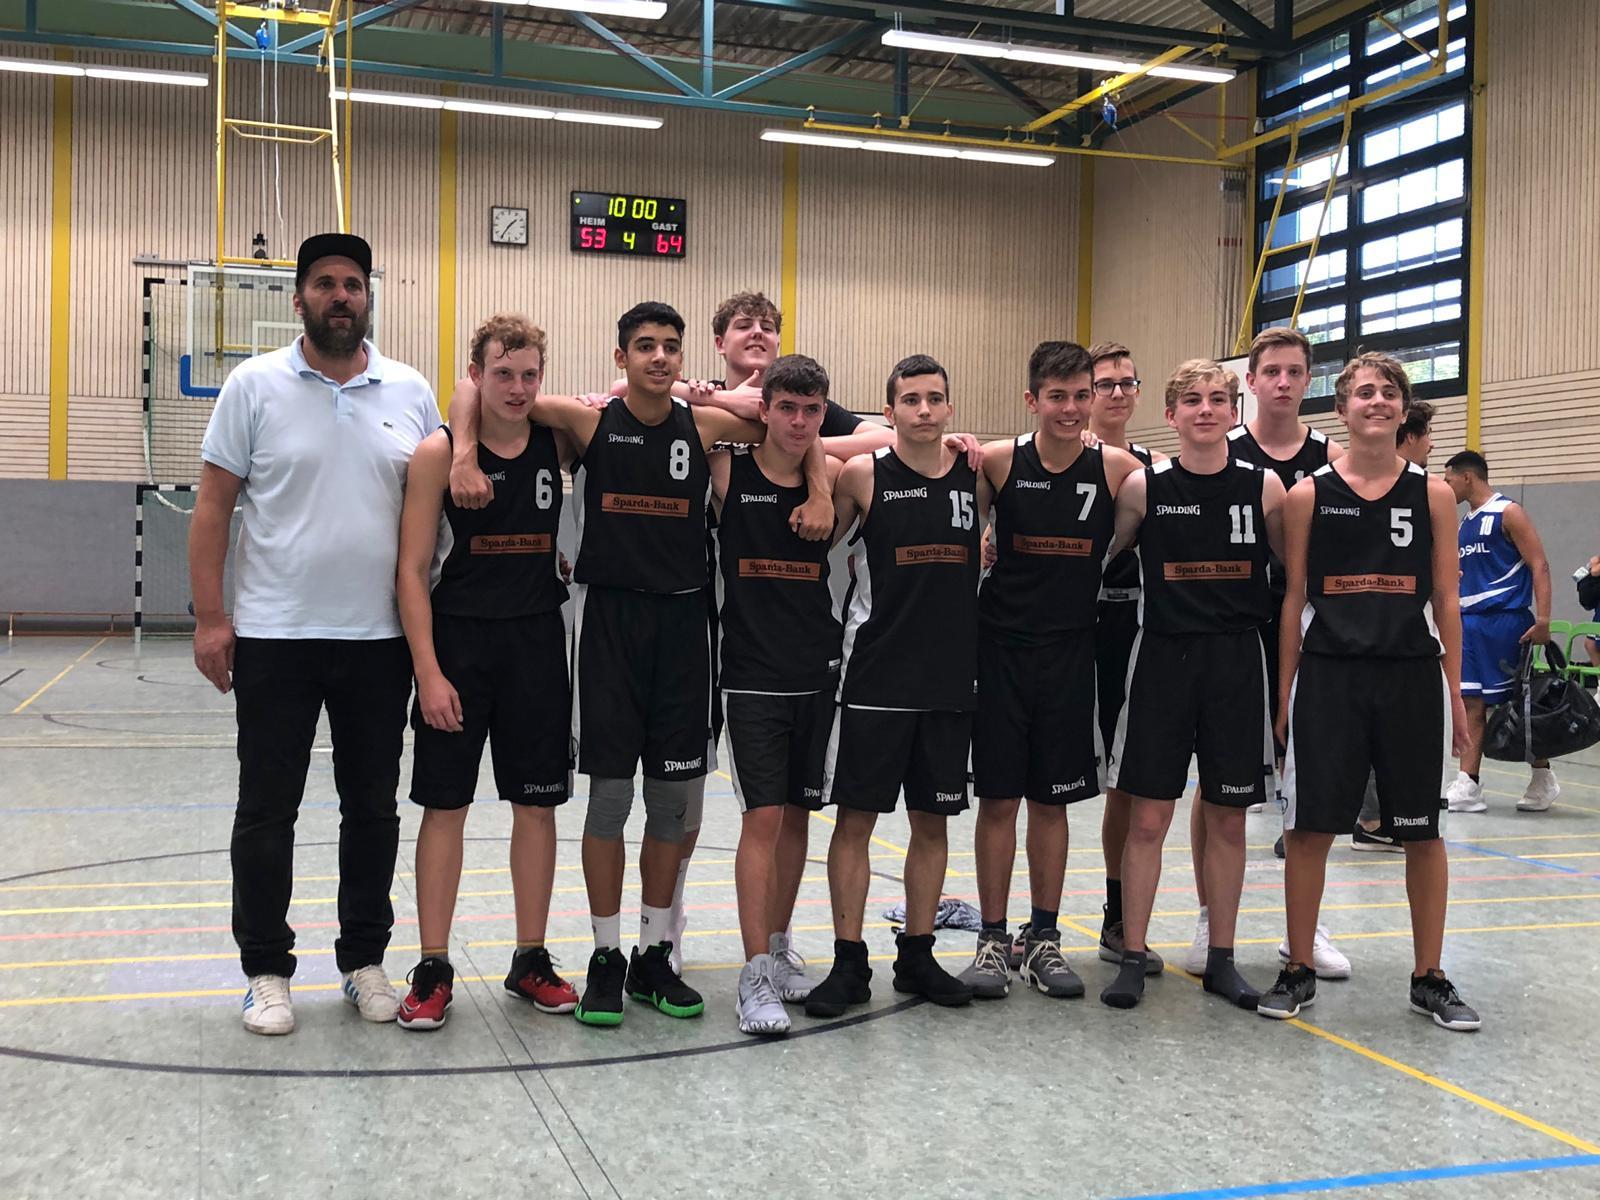 U16: Erster Sieg dank starker Team-Leistung